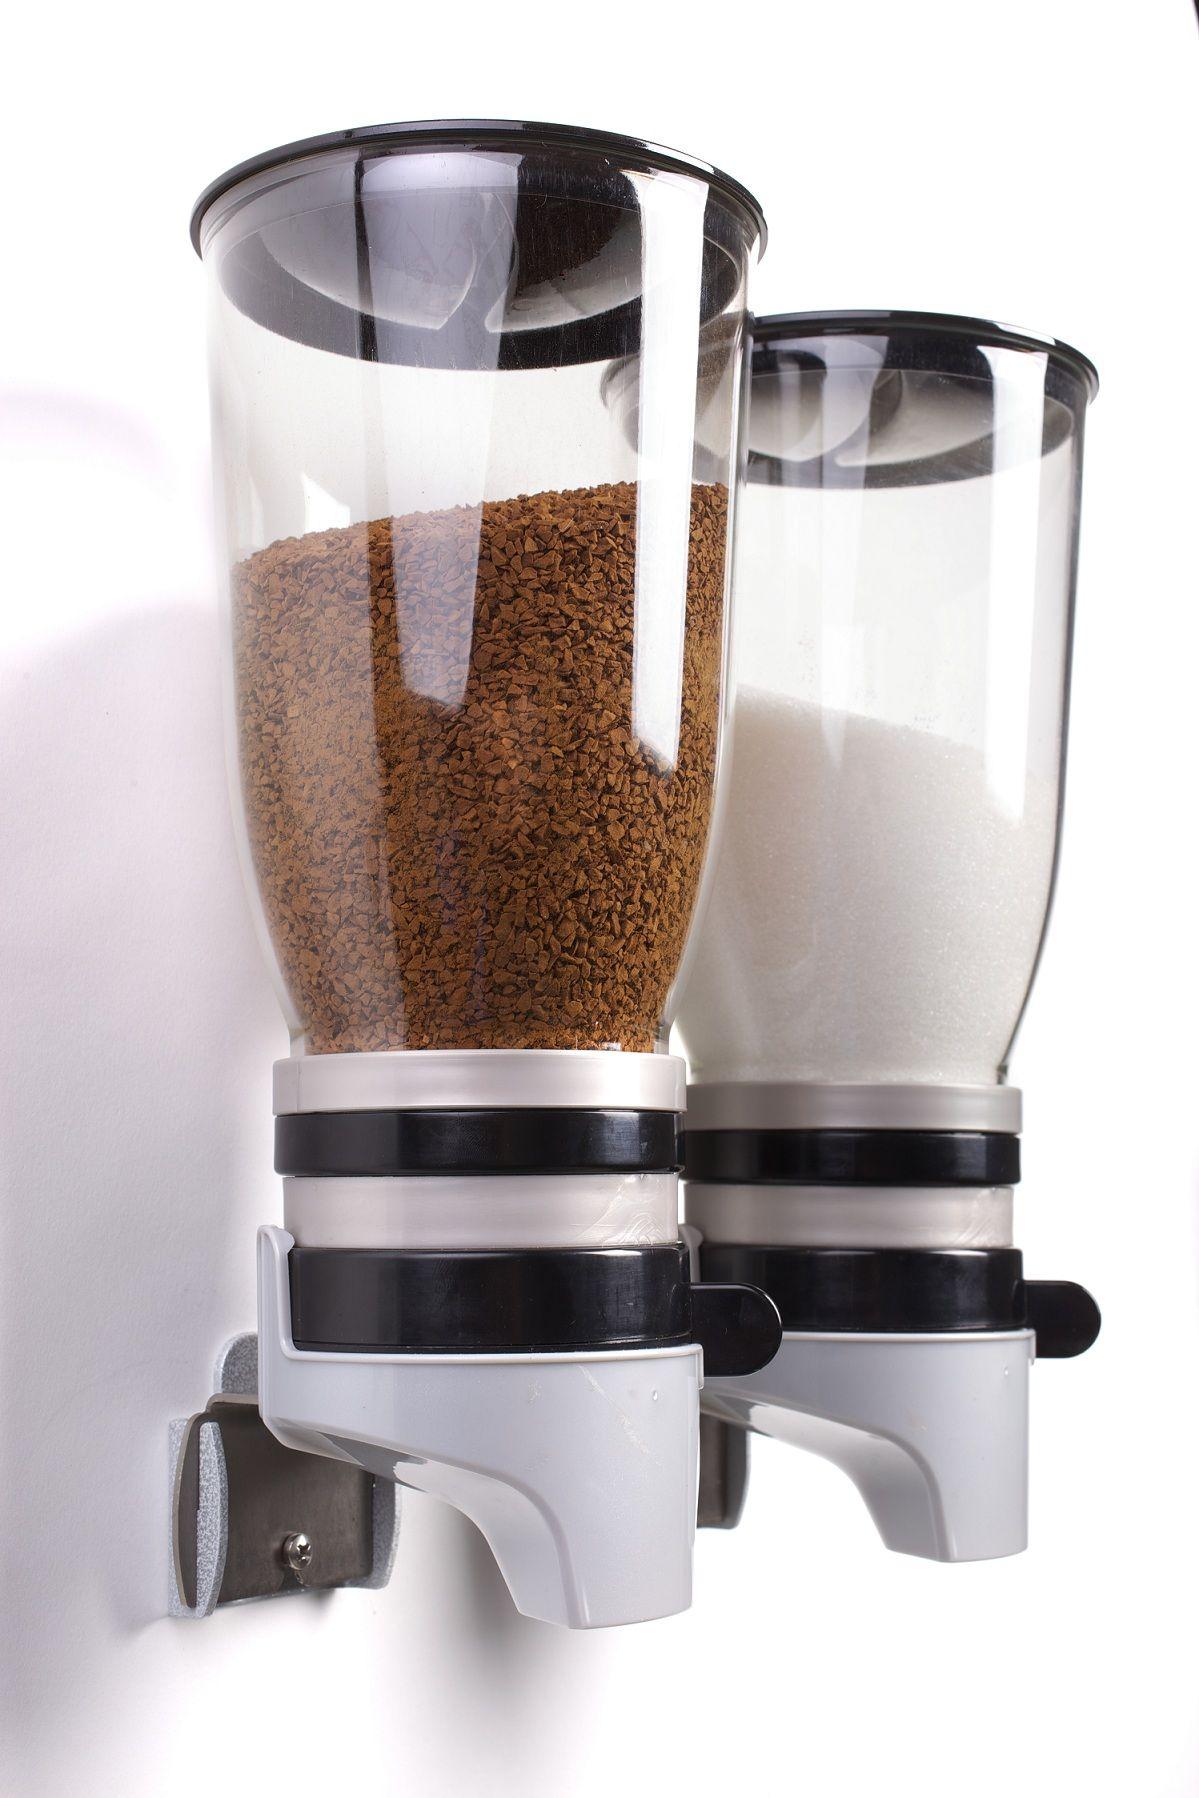 Click Dispenser - Coffee & Powder Dispenser - New! www.IDM ...